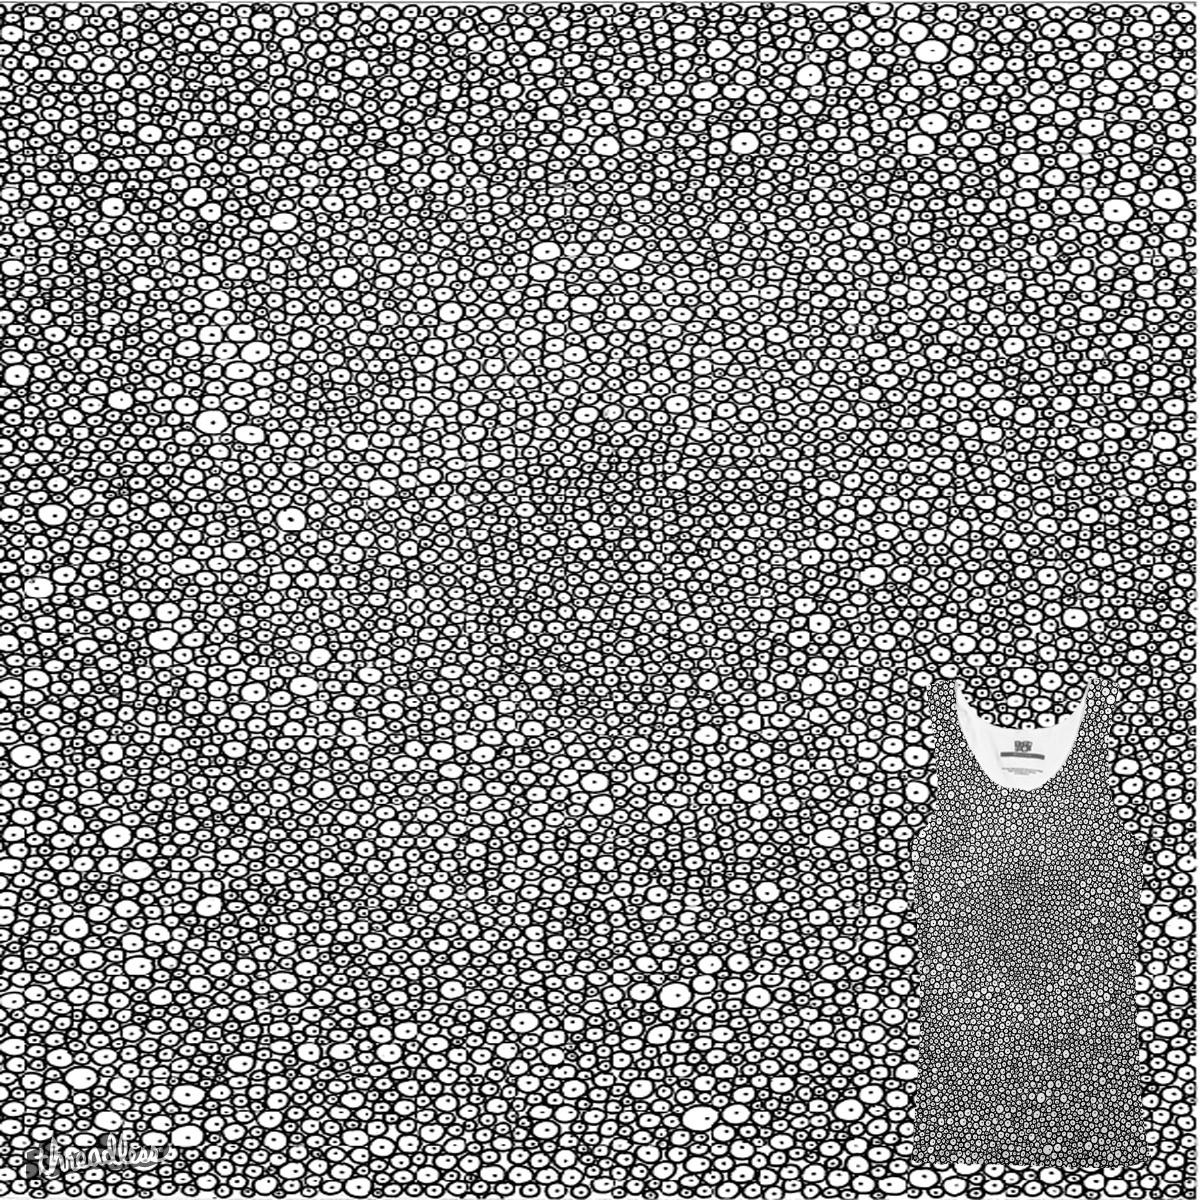 Cells by SanamDehghan on Threadless